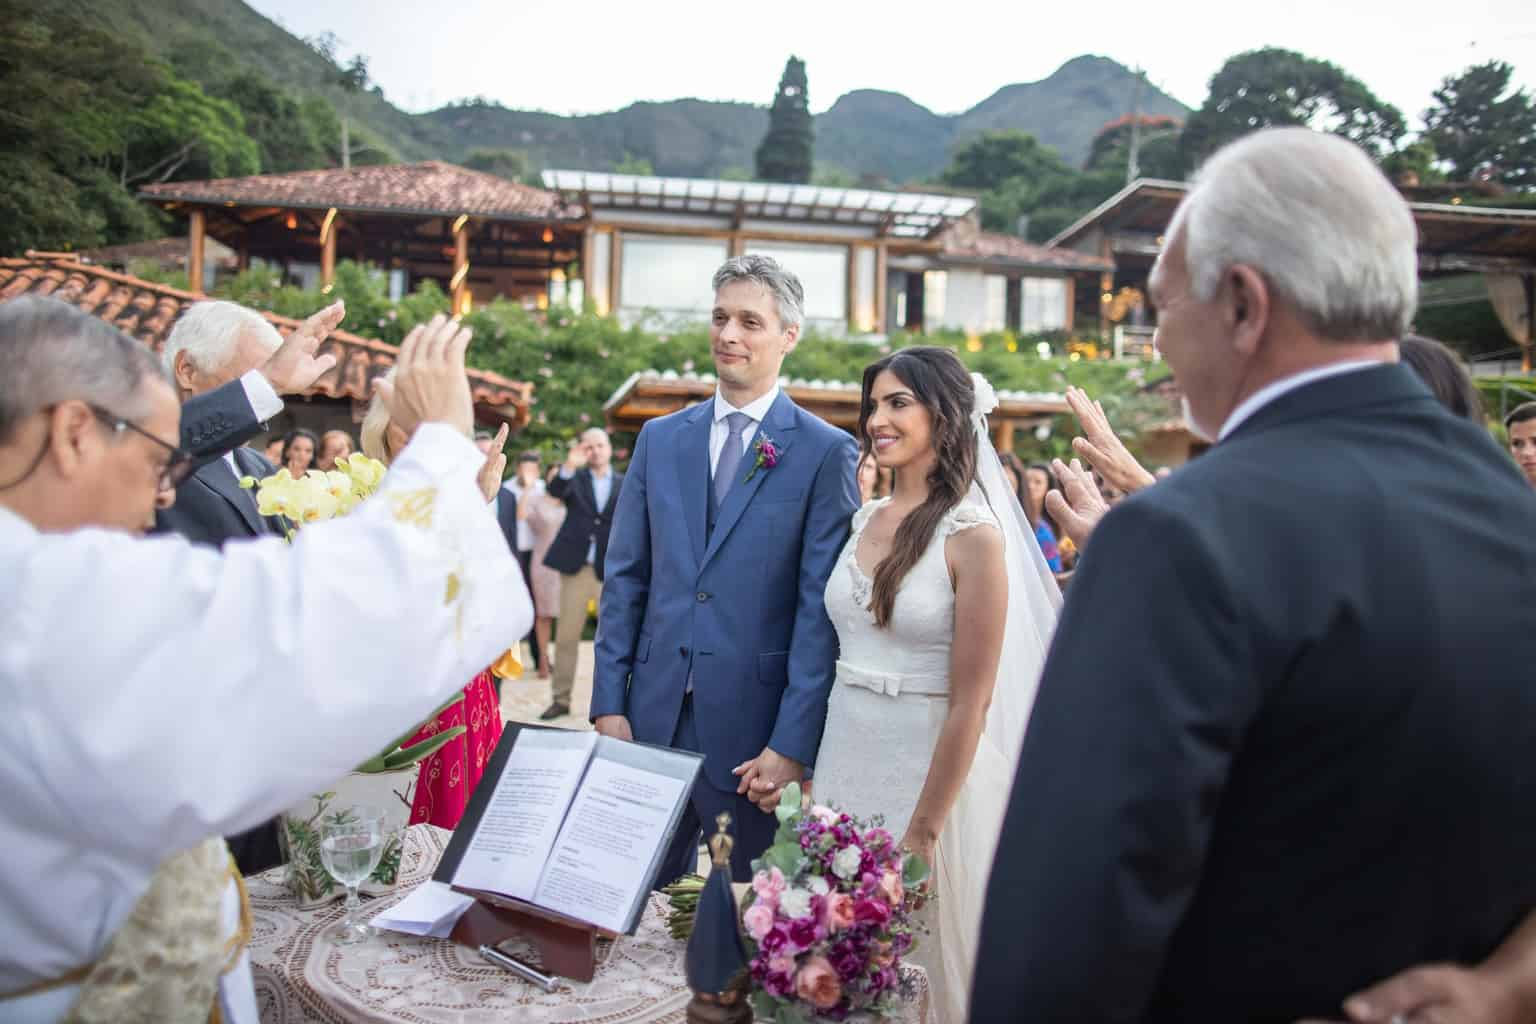 casamento-na-serra-cerimonia-ao-ar-livre-Fotografia-Laura-Campanella-graviola-filmes-Juliana-e-Sebastian-Pousada-La-Belle-Bruna252